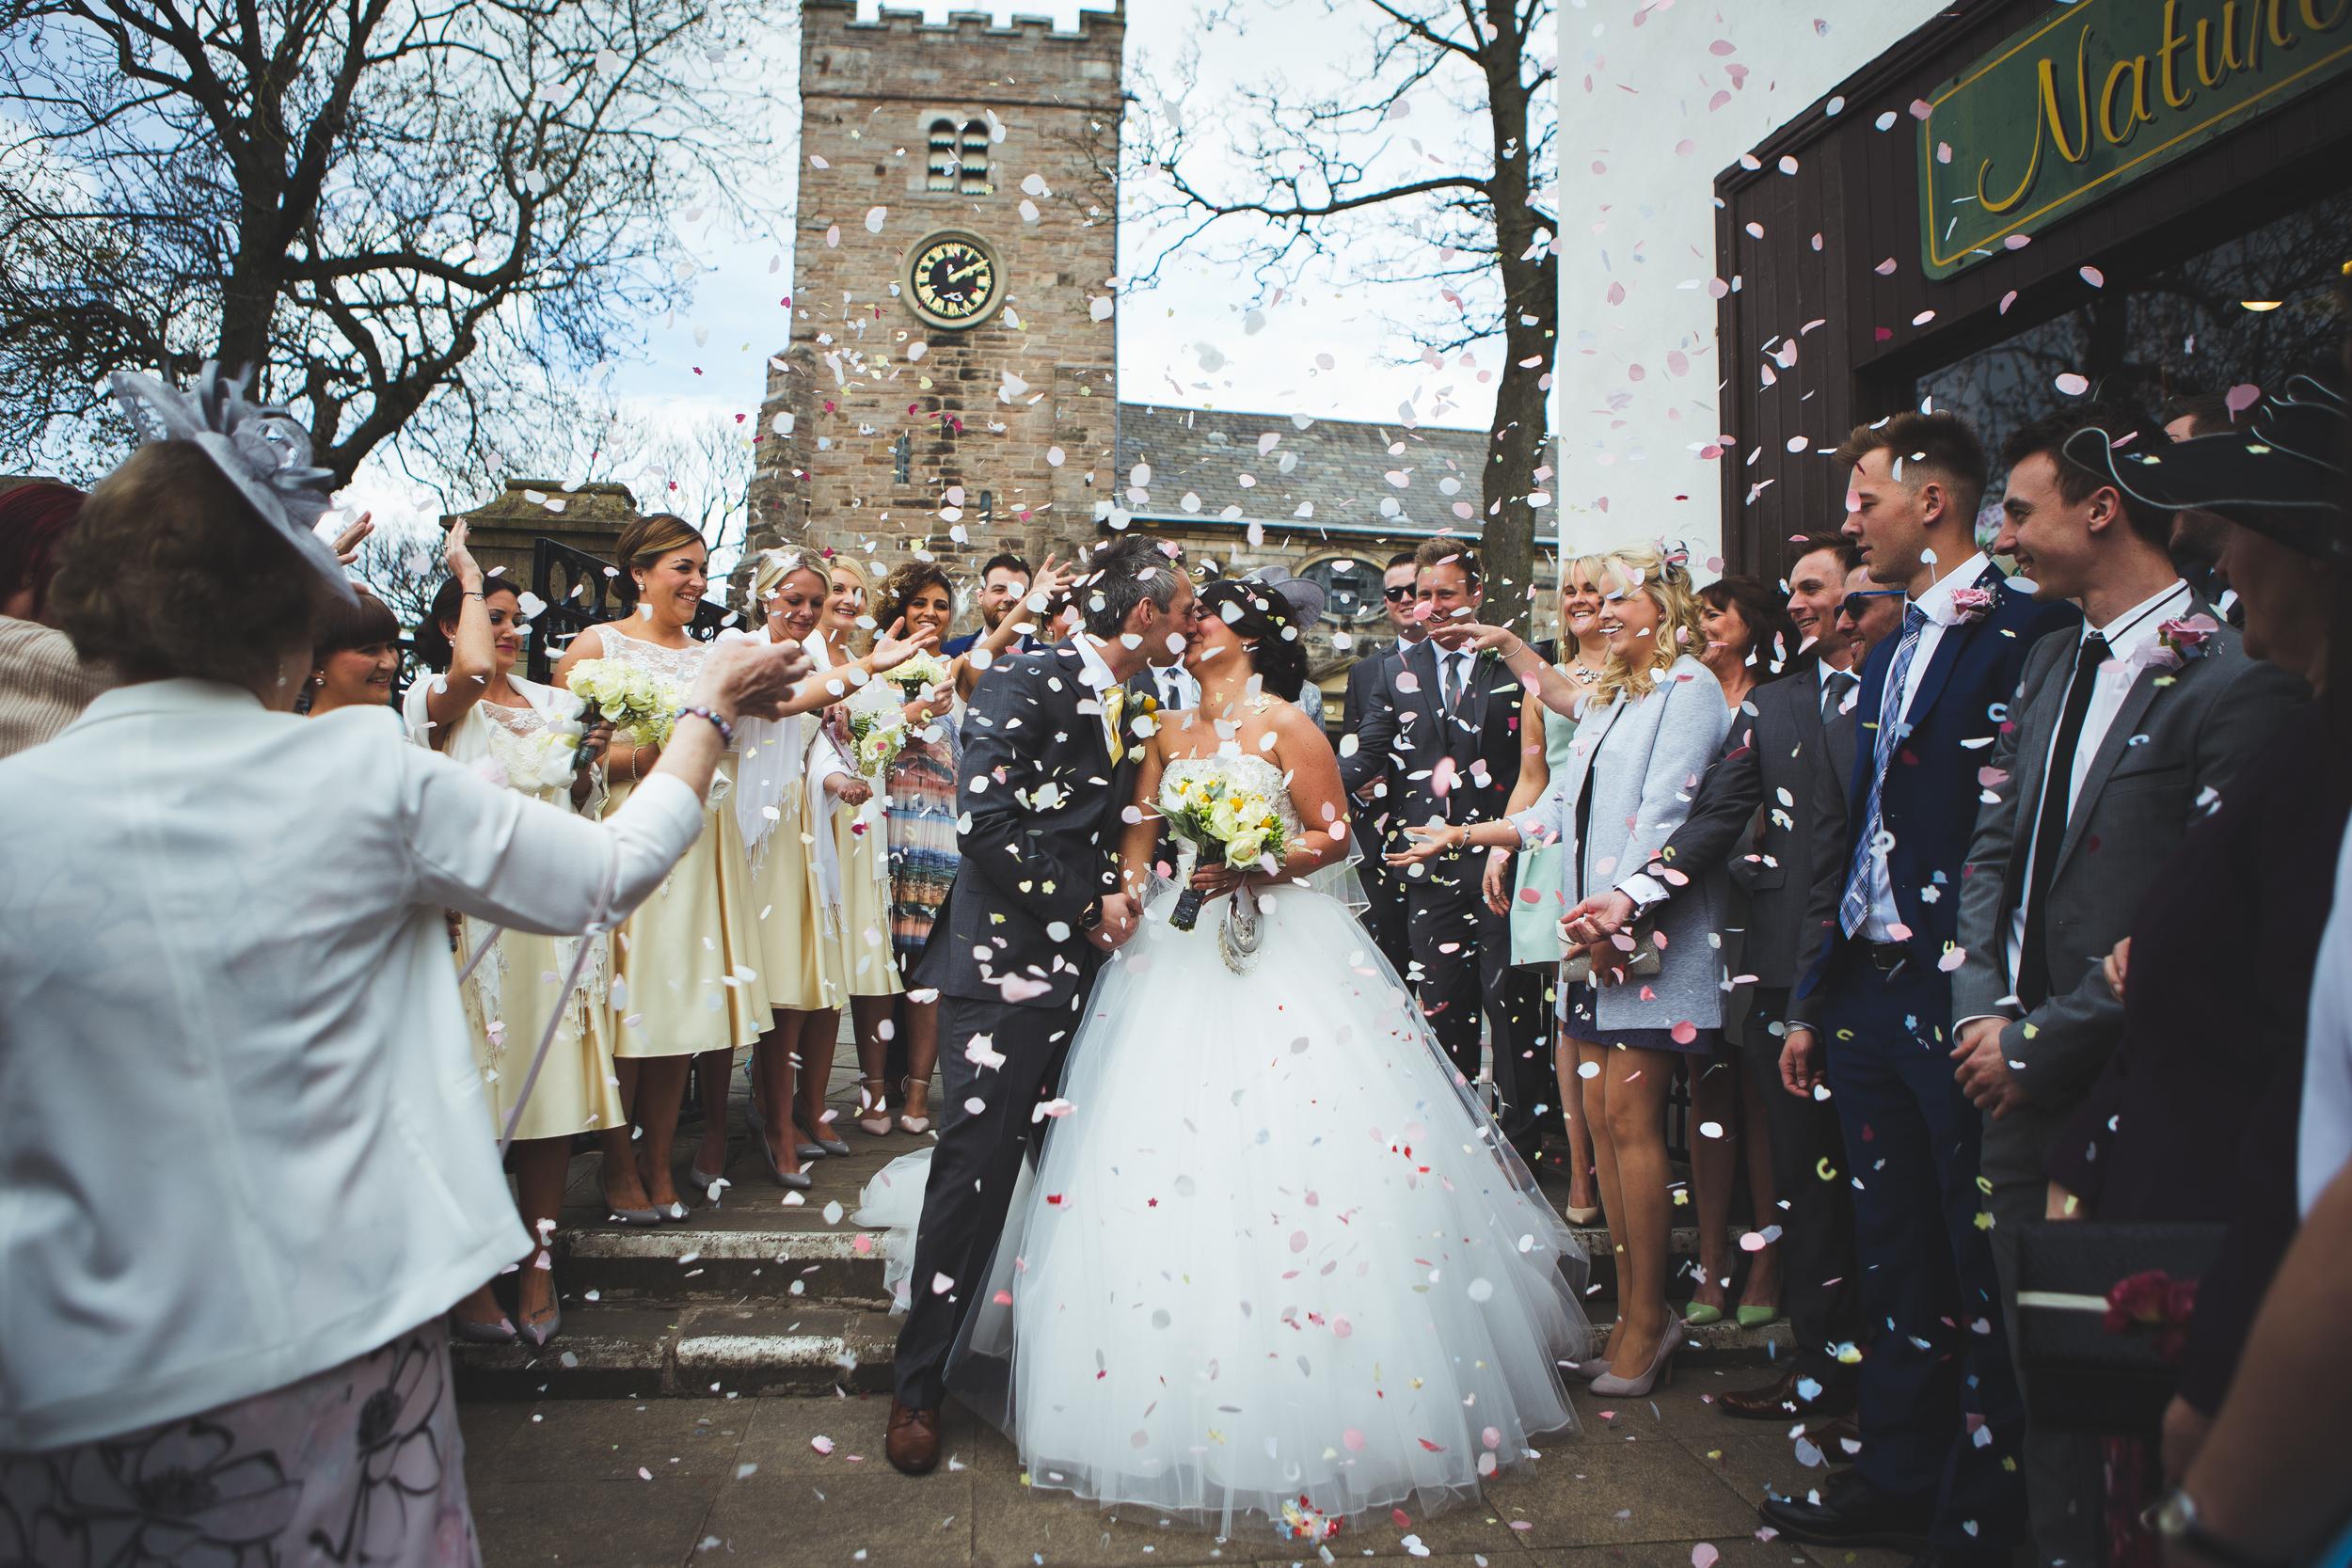 Lancashire wedding photographer - confetti outside church